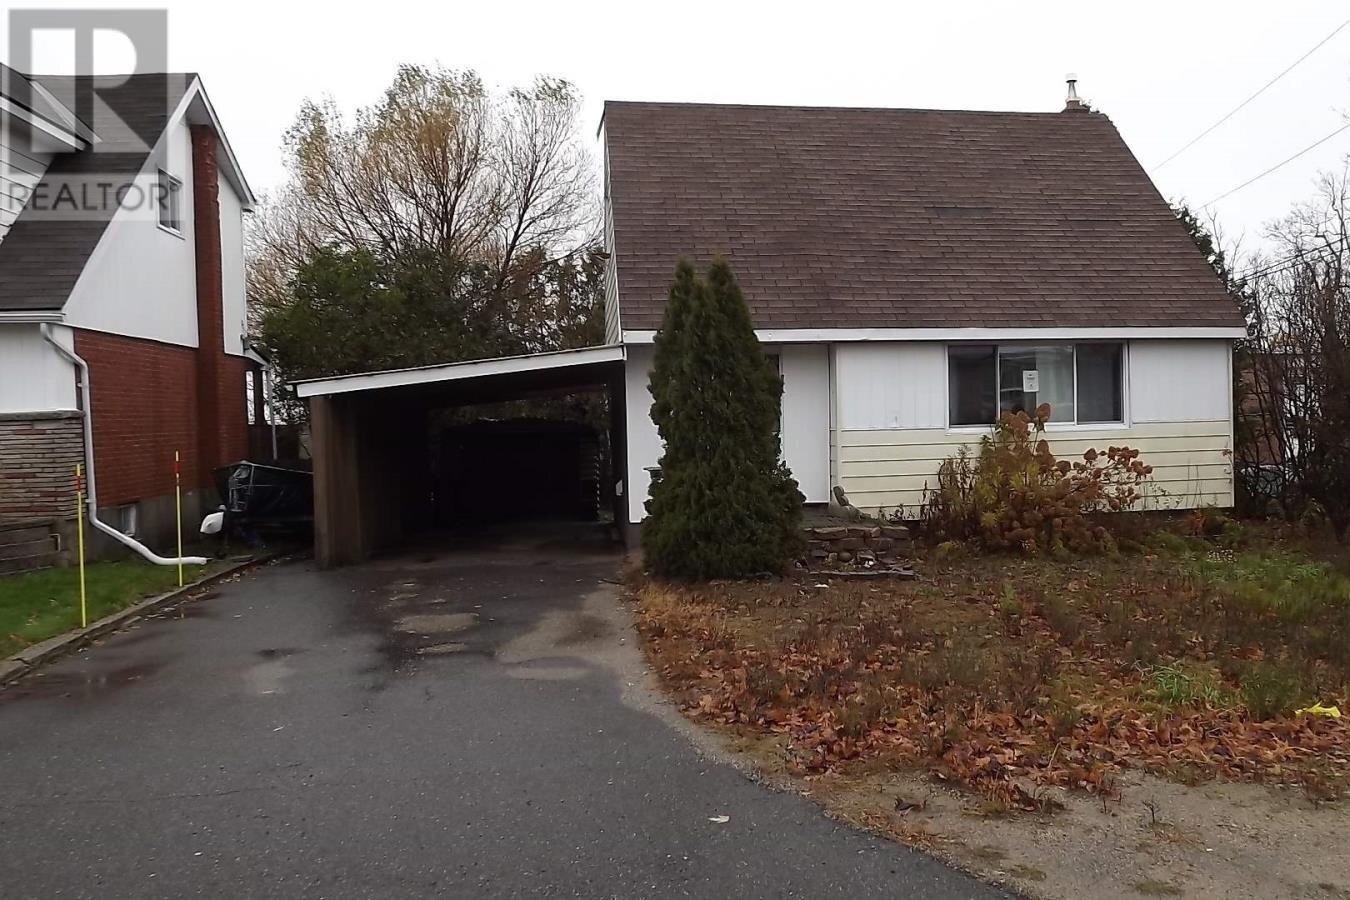 House for sale at 30 Hirshhorn Ave Elliot Lake Ontario - MLS: SM130150